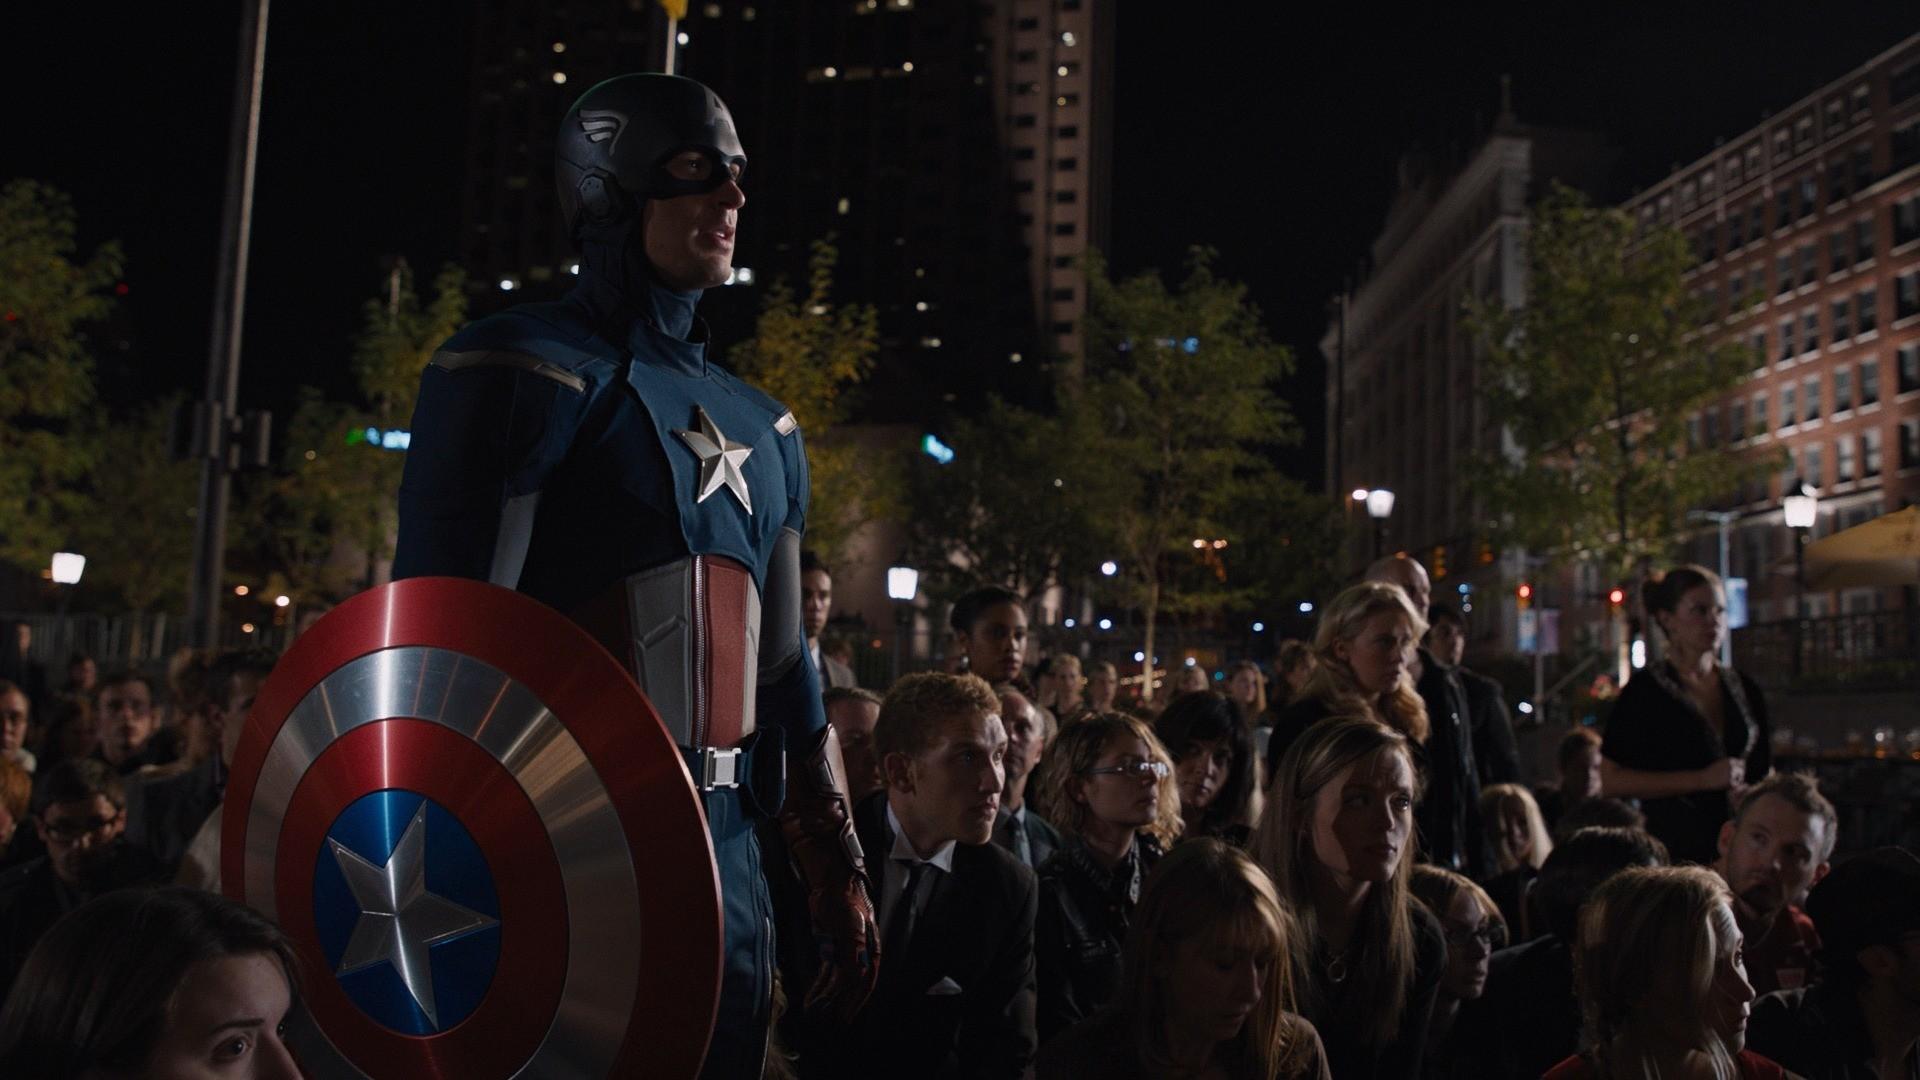 The Avengers, Marvel, Marvel superheroes, the team, the organization,  SCH.I.T, SHIELD, Captain America, Steve Rogers, Chris Evans, a super  soldier suit, …